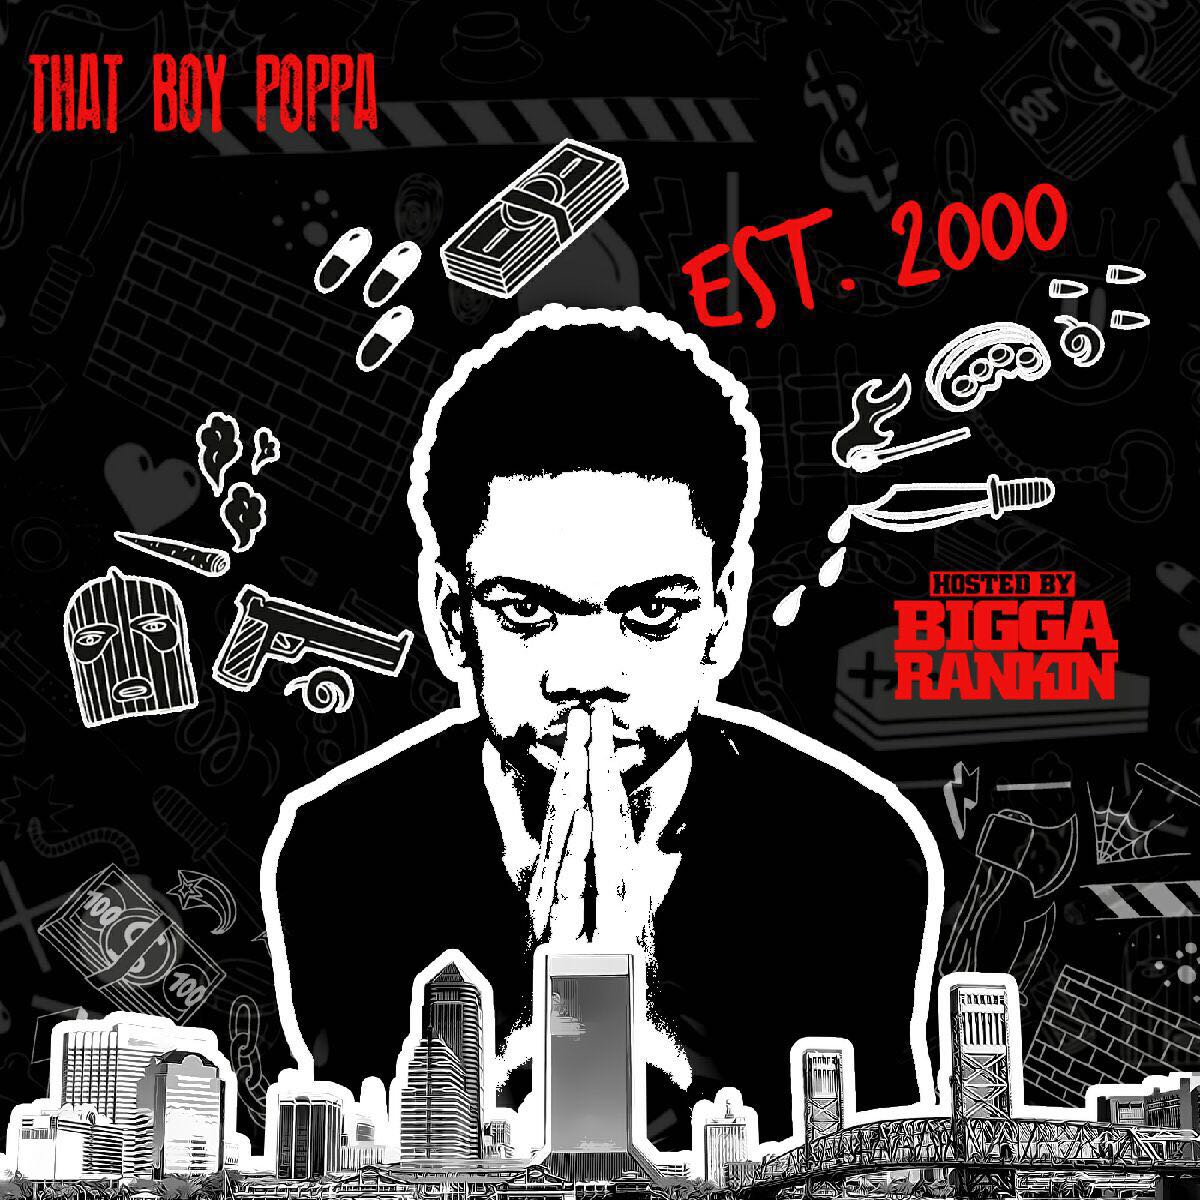 ThatBoyPoppa - Est 2000 cover